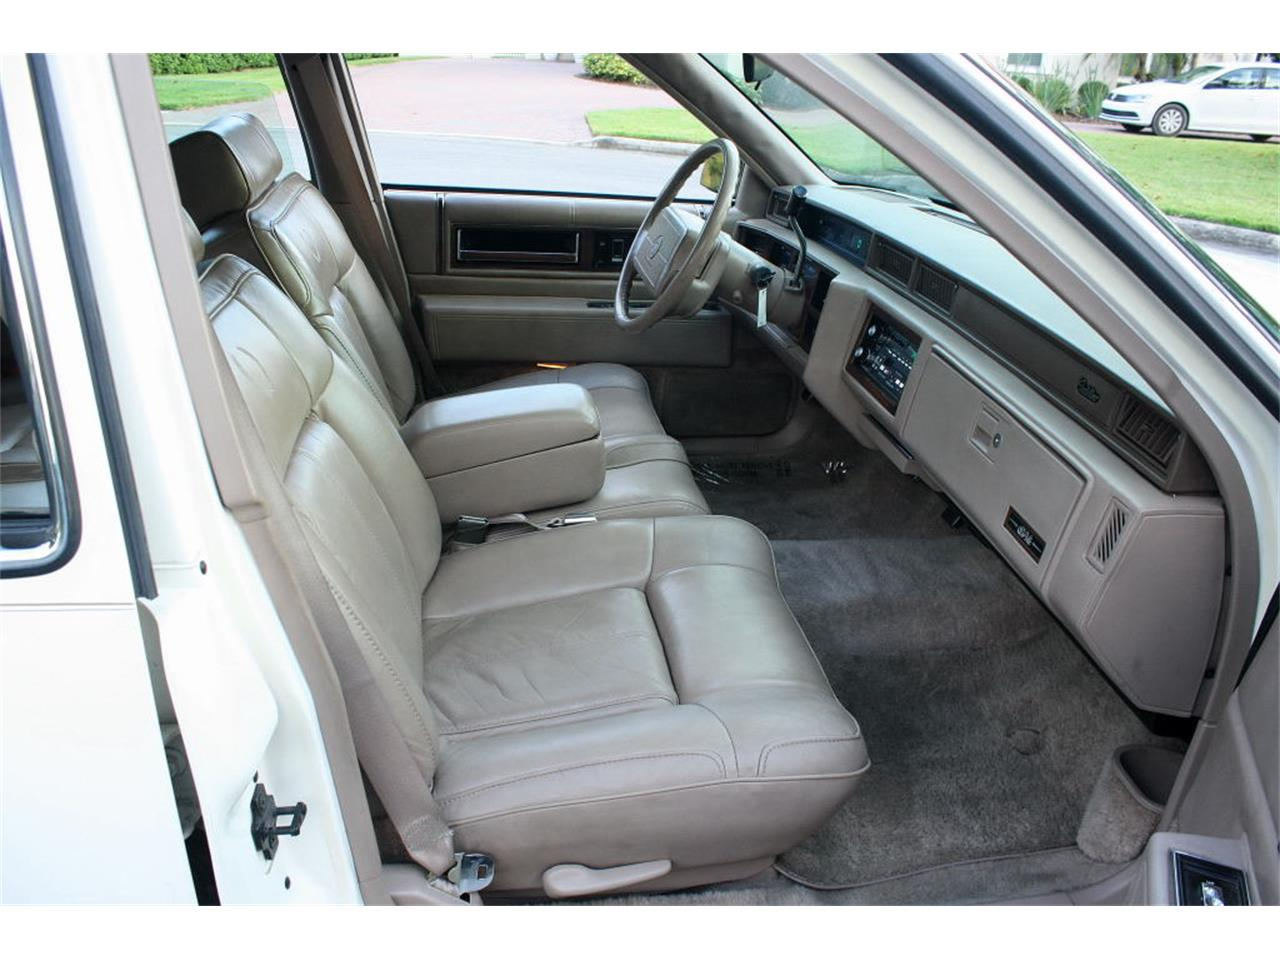 Large Picture of 1991 Sedan - $9,500.00 - L5XM